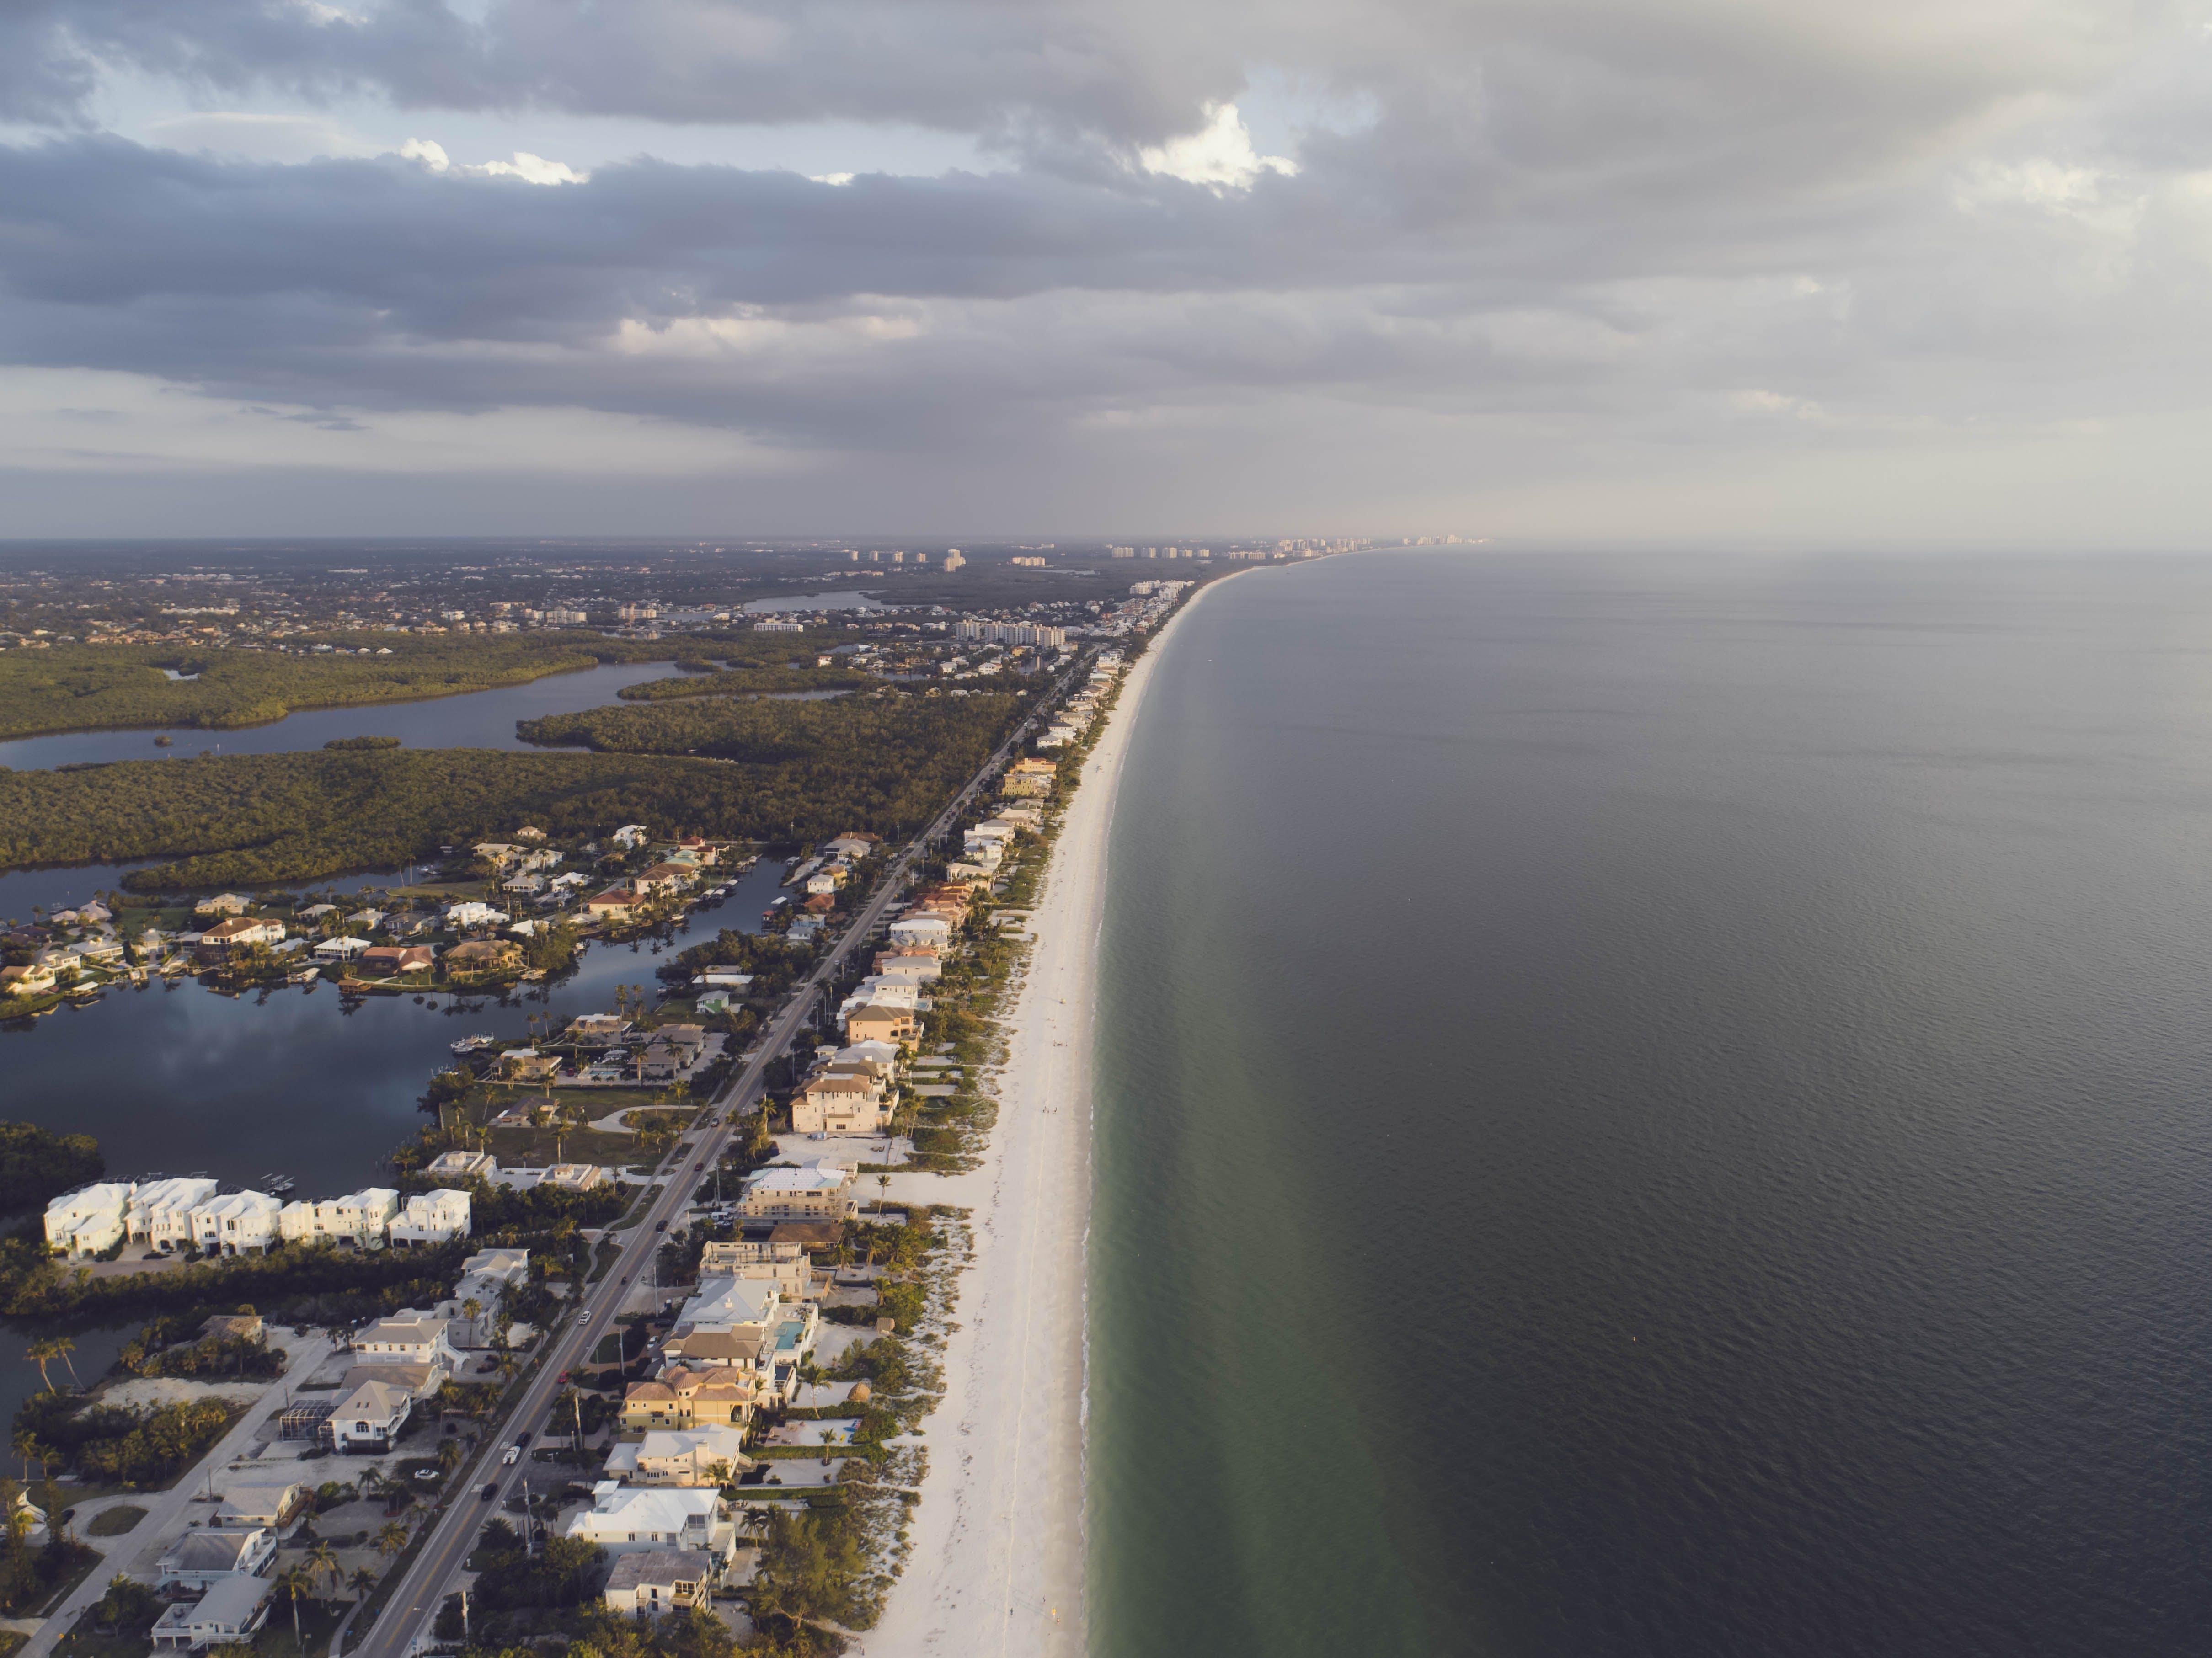 Bird's Eye View of Coastline